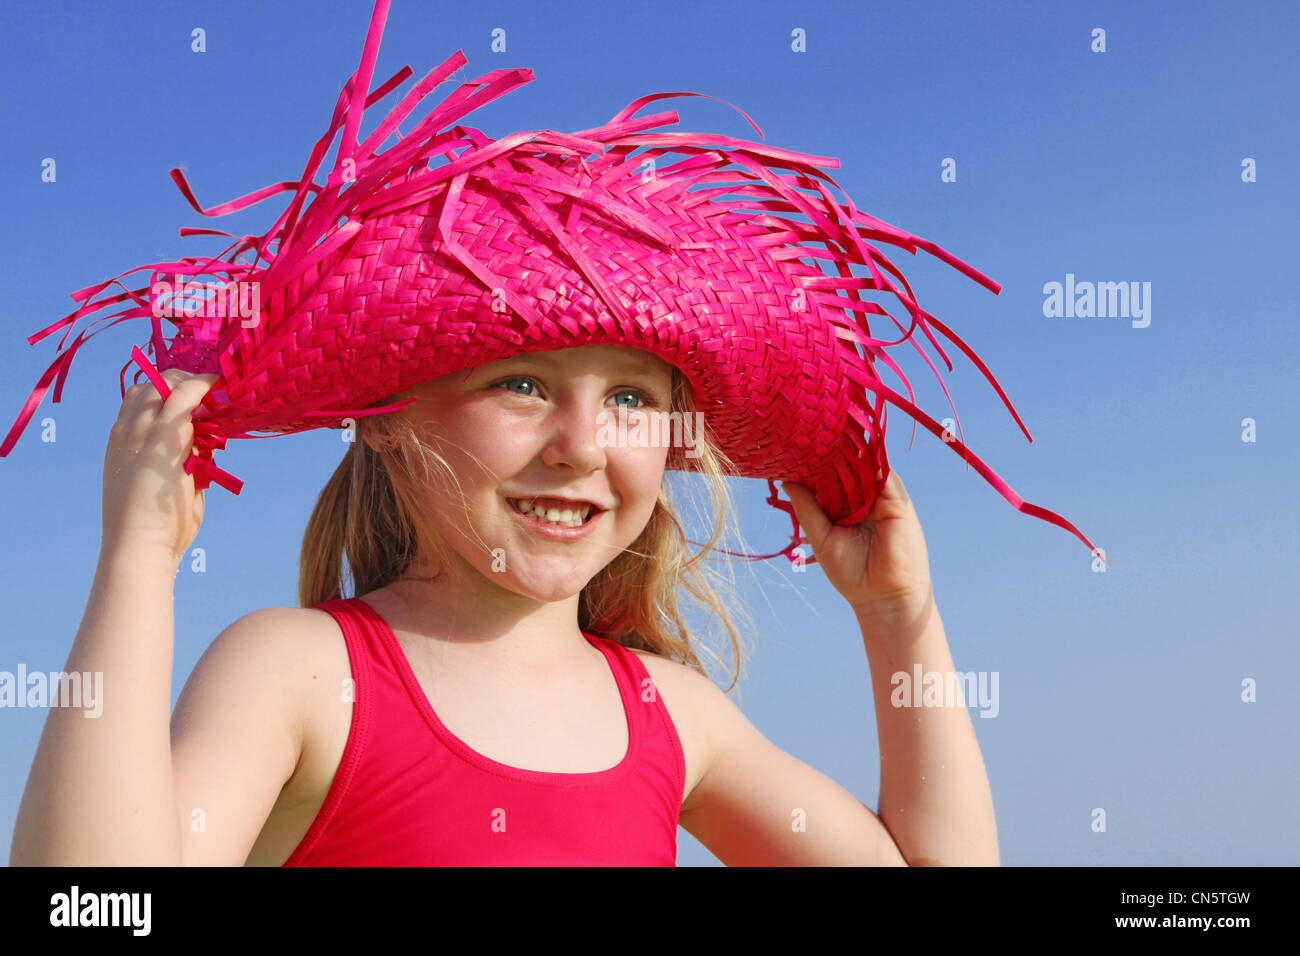 happy summer child in sun hat - Stock Image